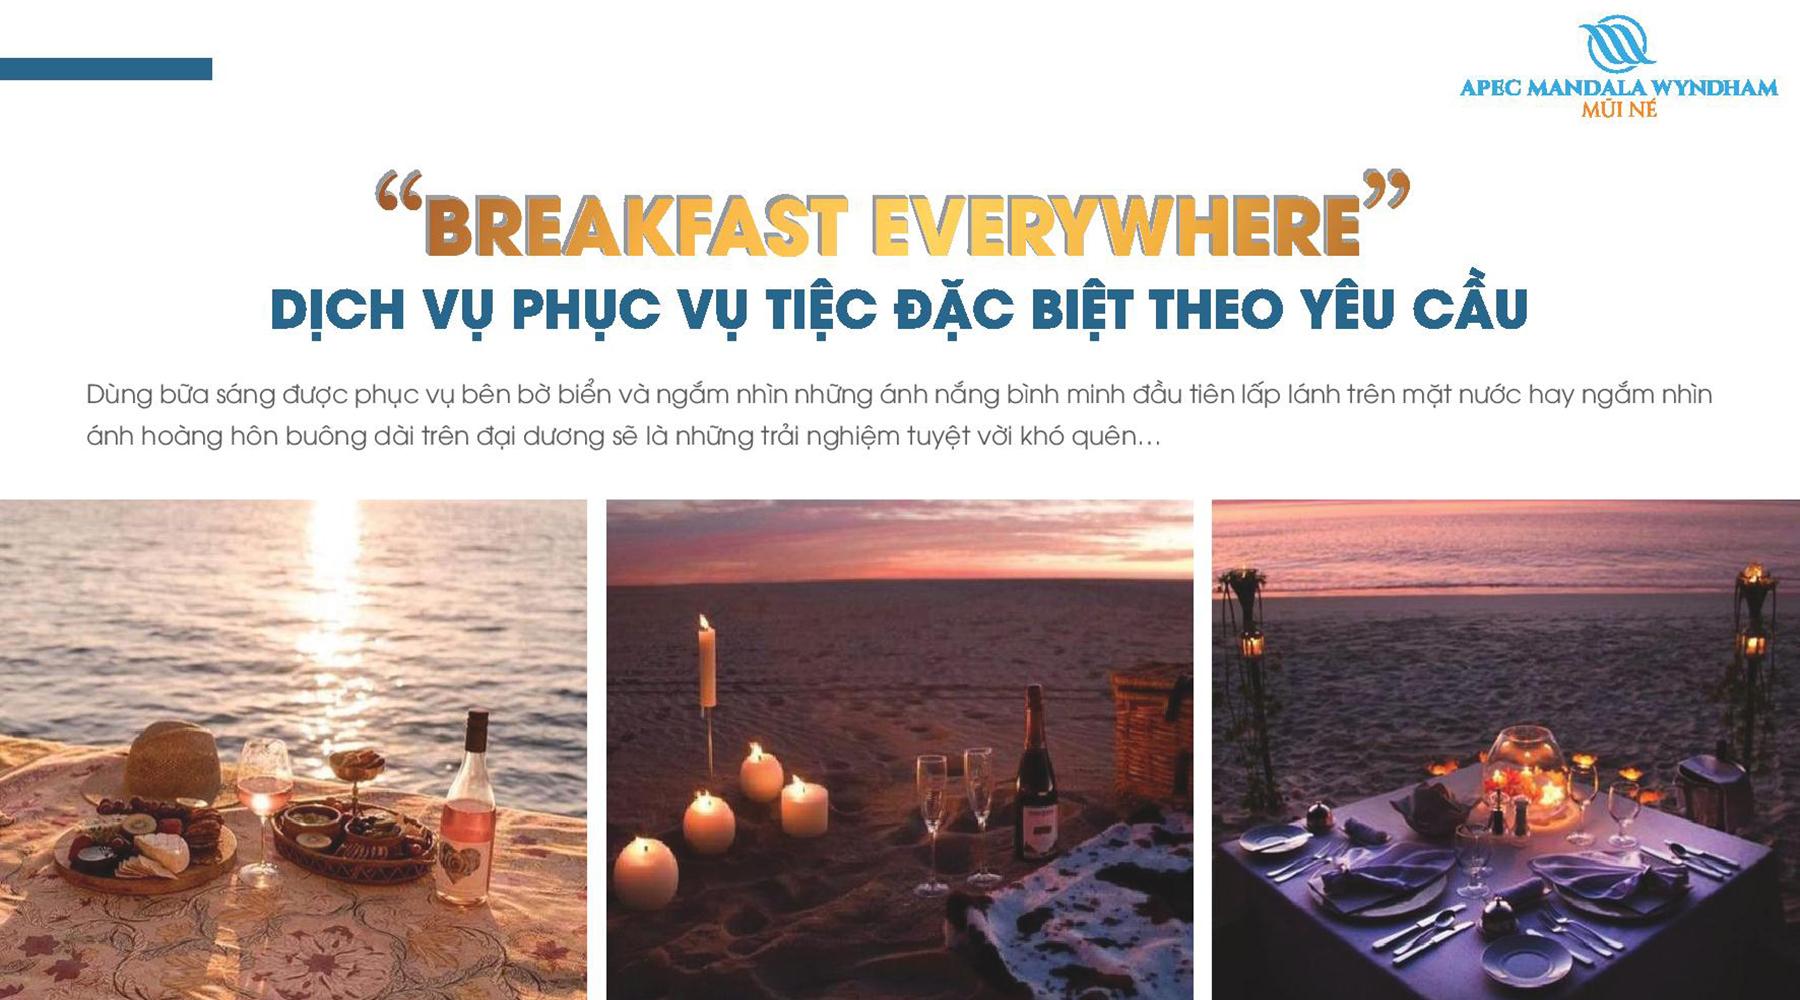 Tiện ích dự án Apec Mandala Wyndham Mũi Né Breakfast Everywhere